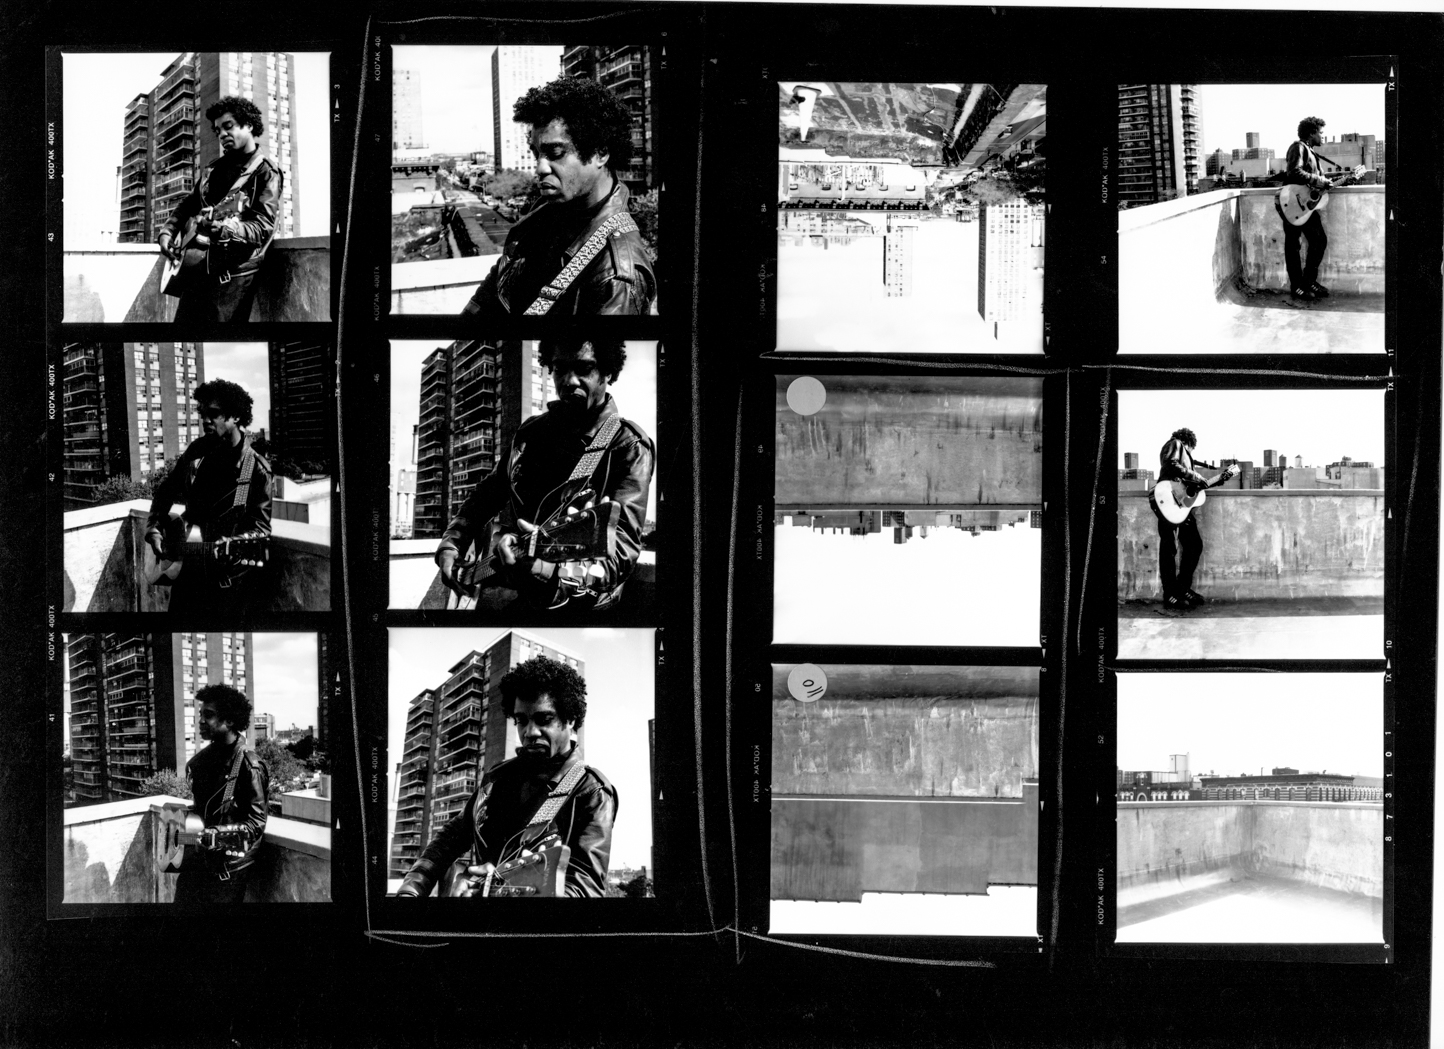 Kontakt_NYC_LES_Baby_M_Roof_Guitar | DC / P